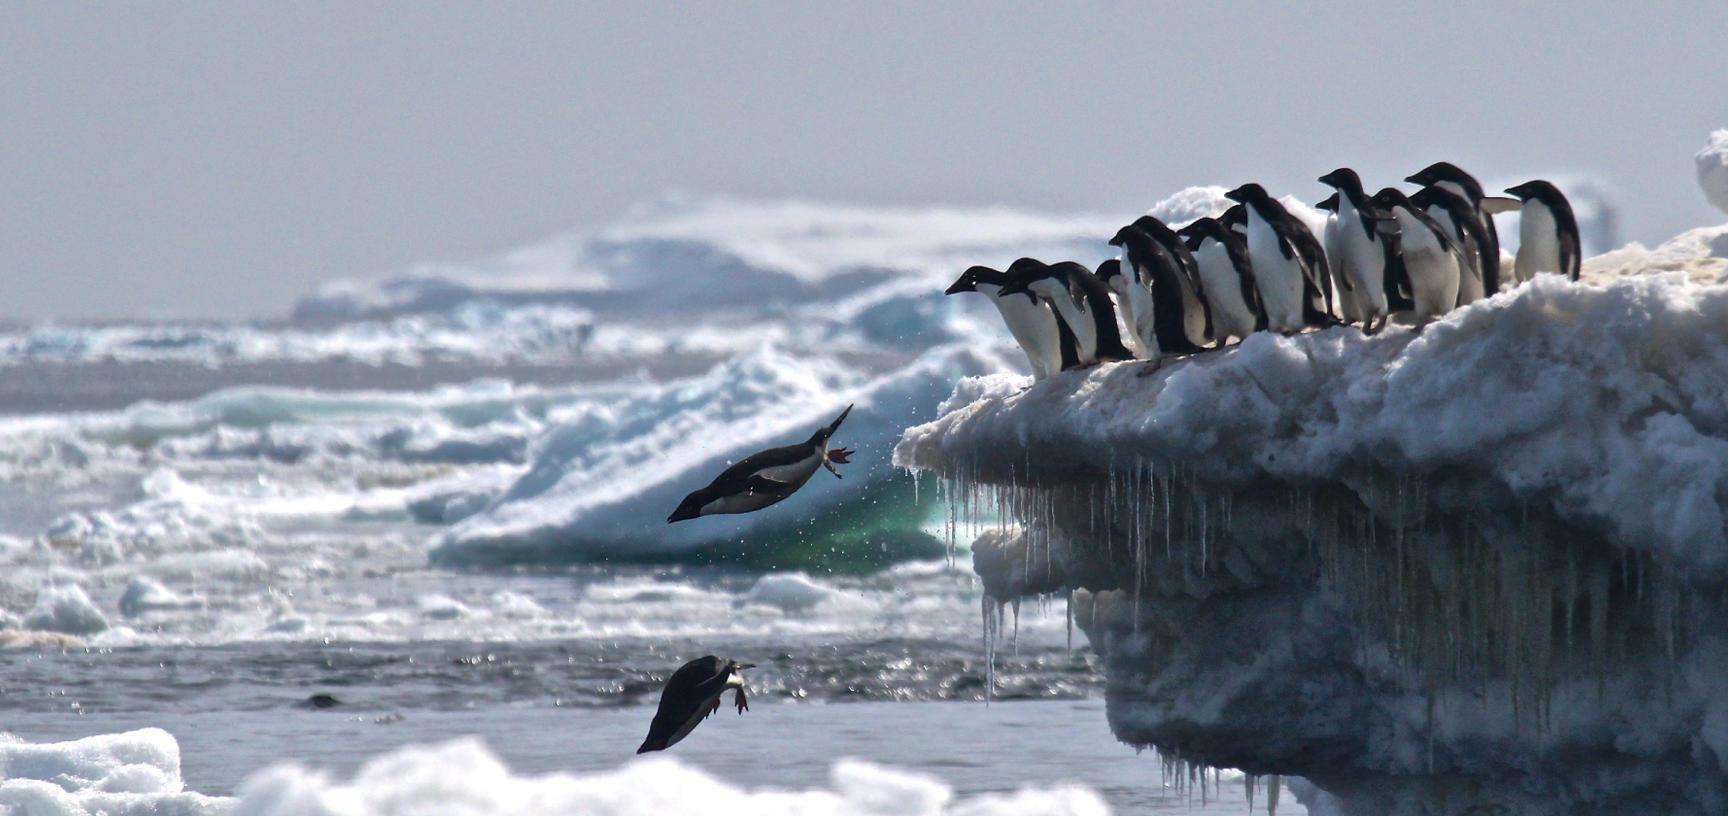 adelie penguins jumping of iceberg danger islands antarctica credit rachael herman stony brook university louisiana state university